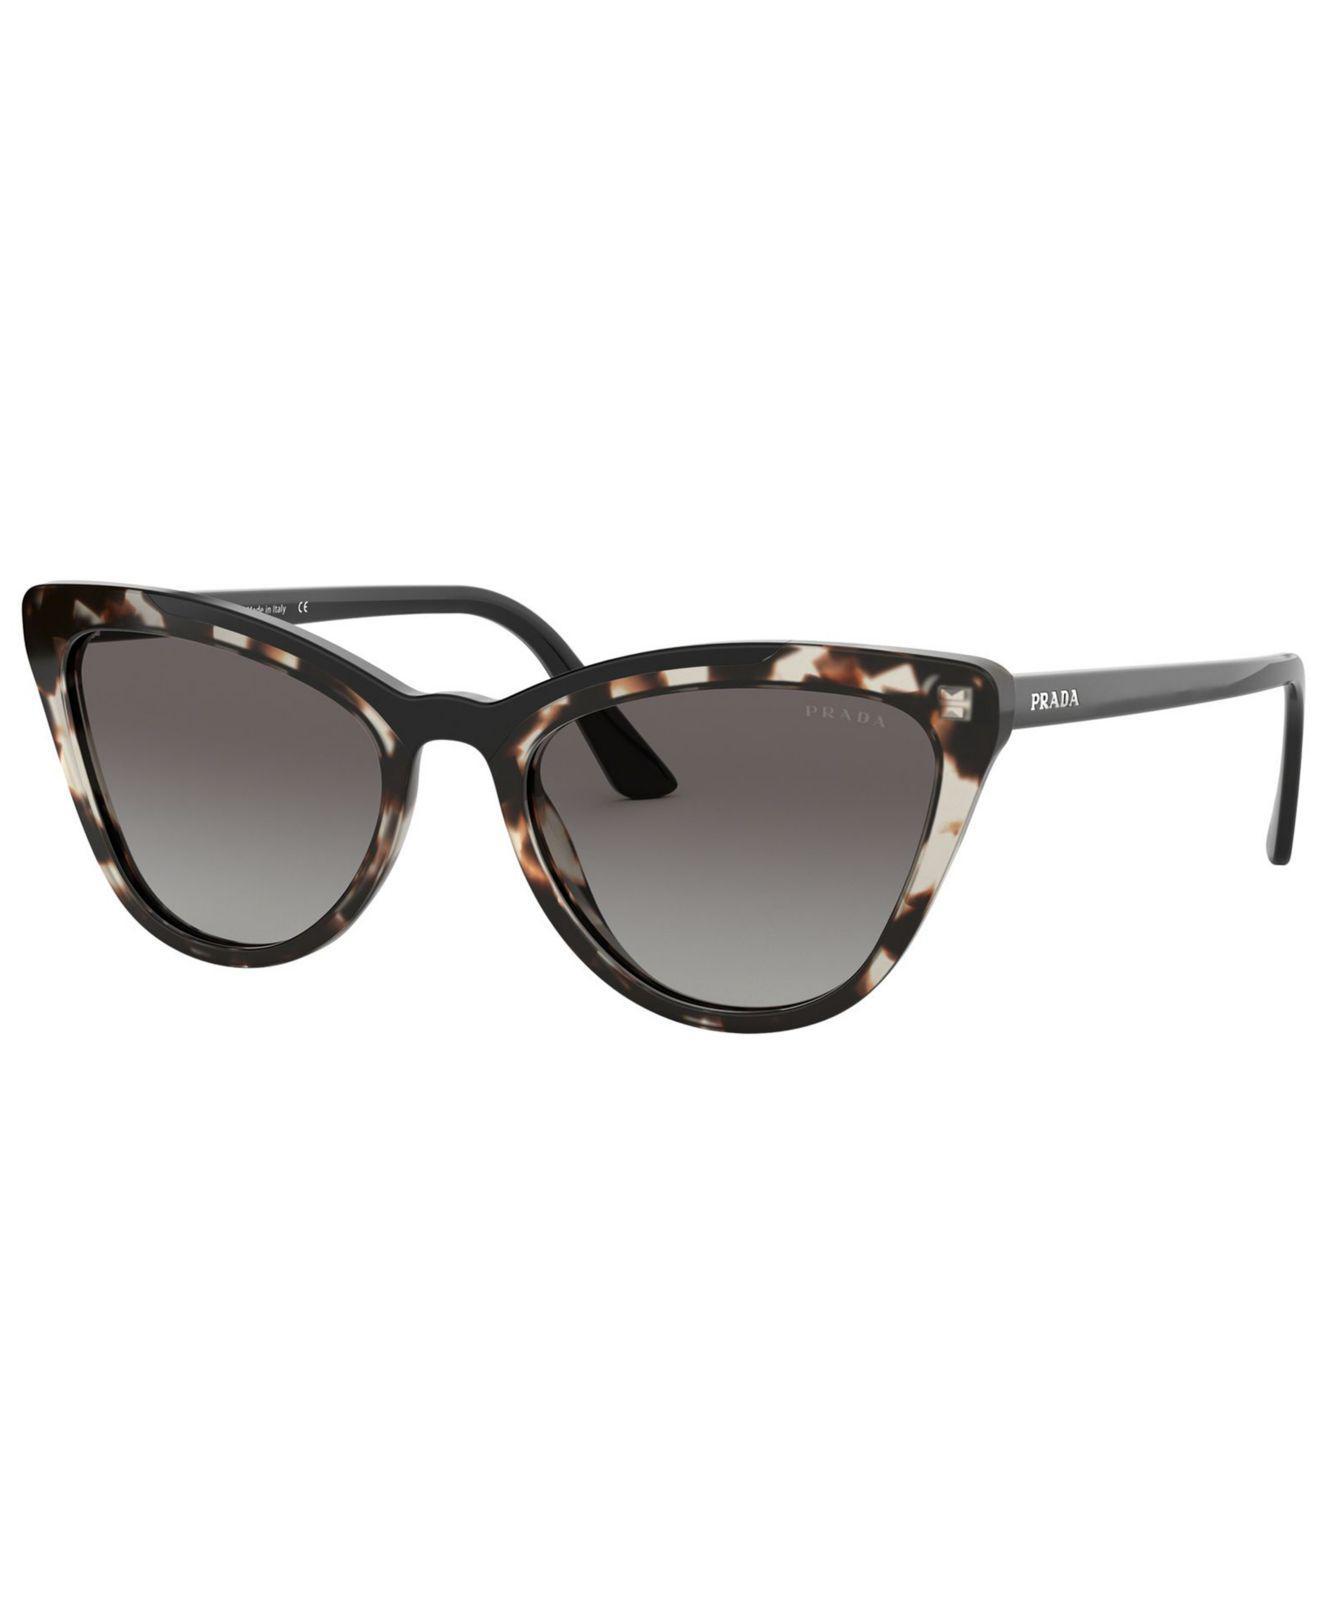 a092900e67aa Prada Sunglasses, Pr 01vs 56 - Lyst